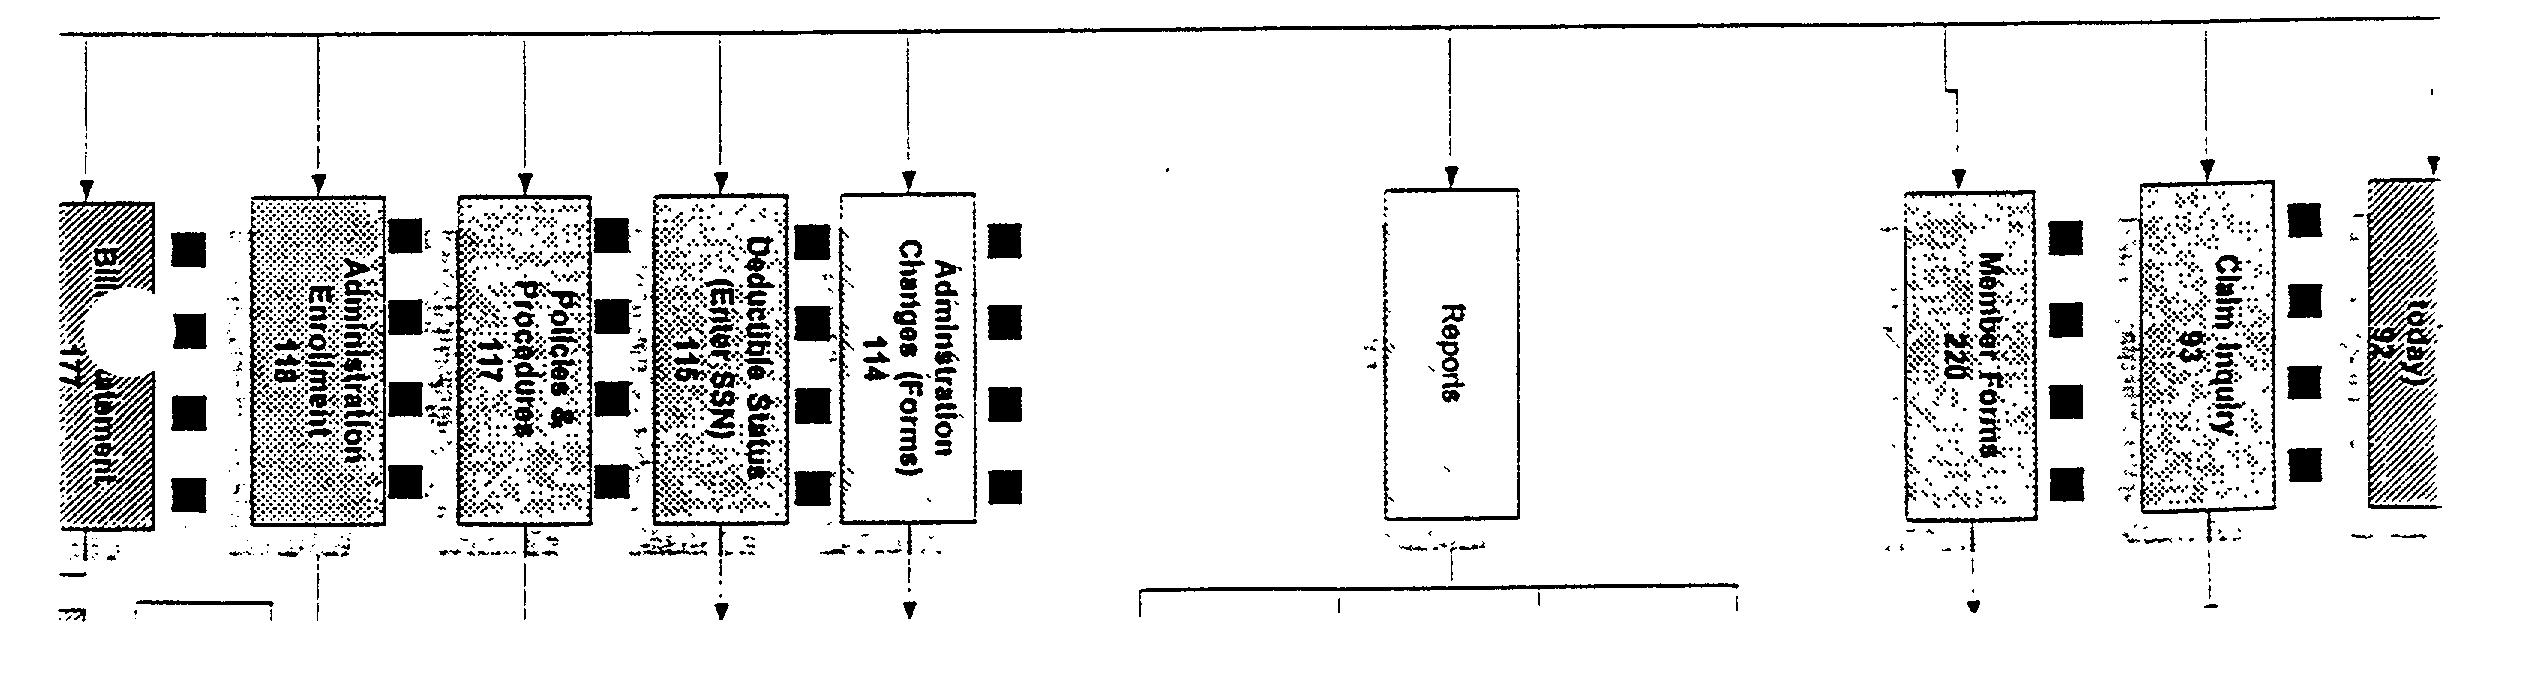 Figure US20020149616A1-20021017-P00223